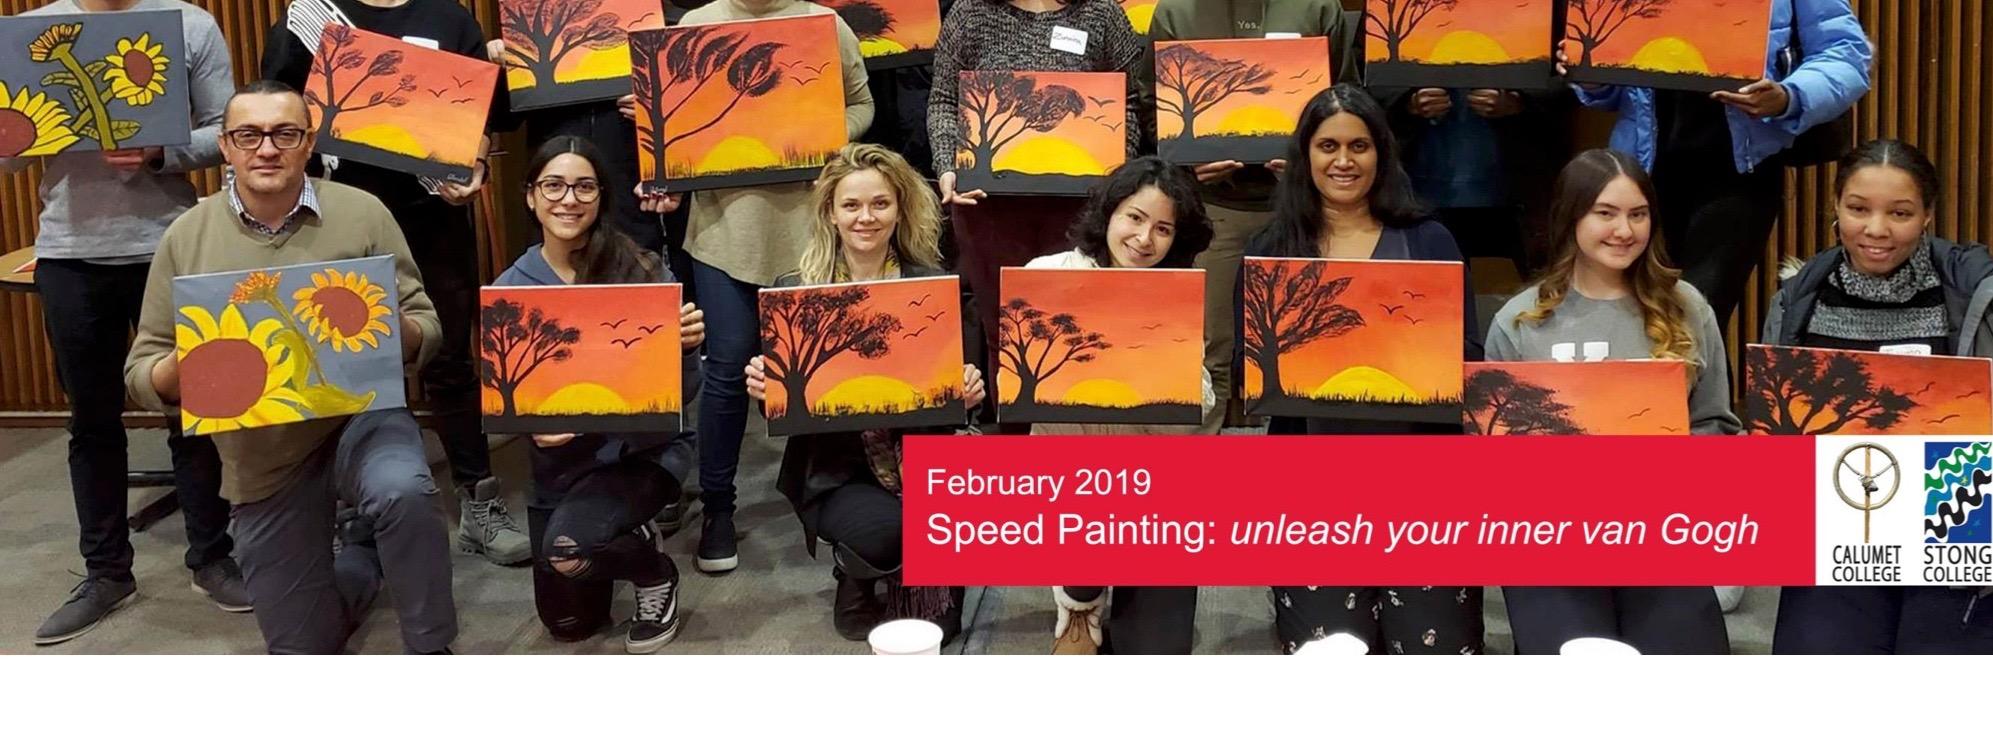 Speed Painting